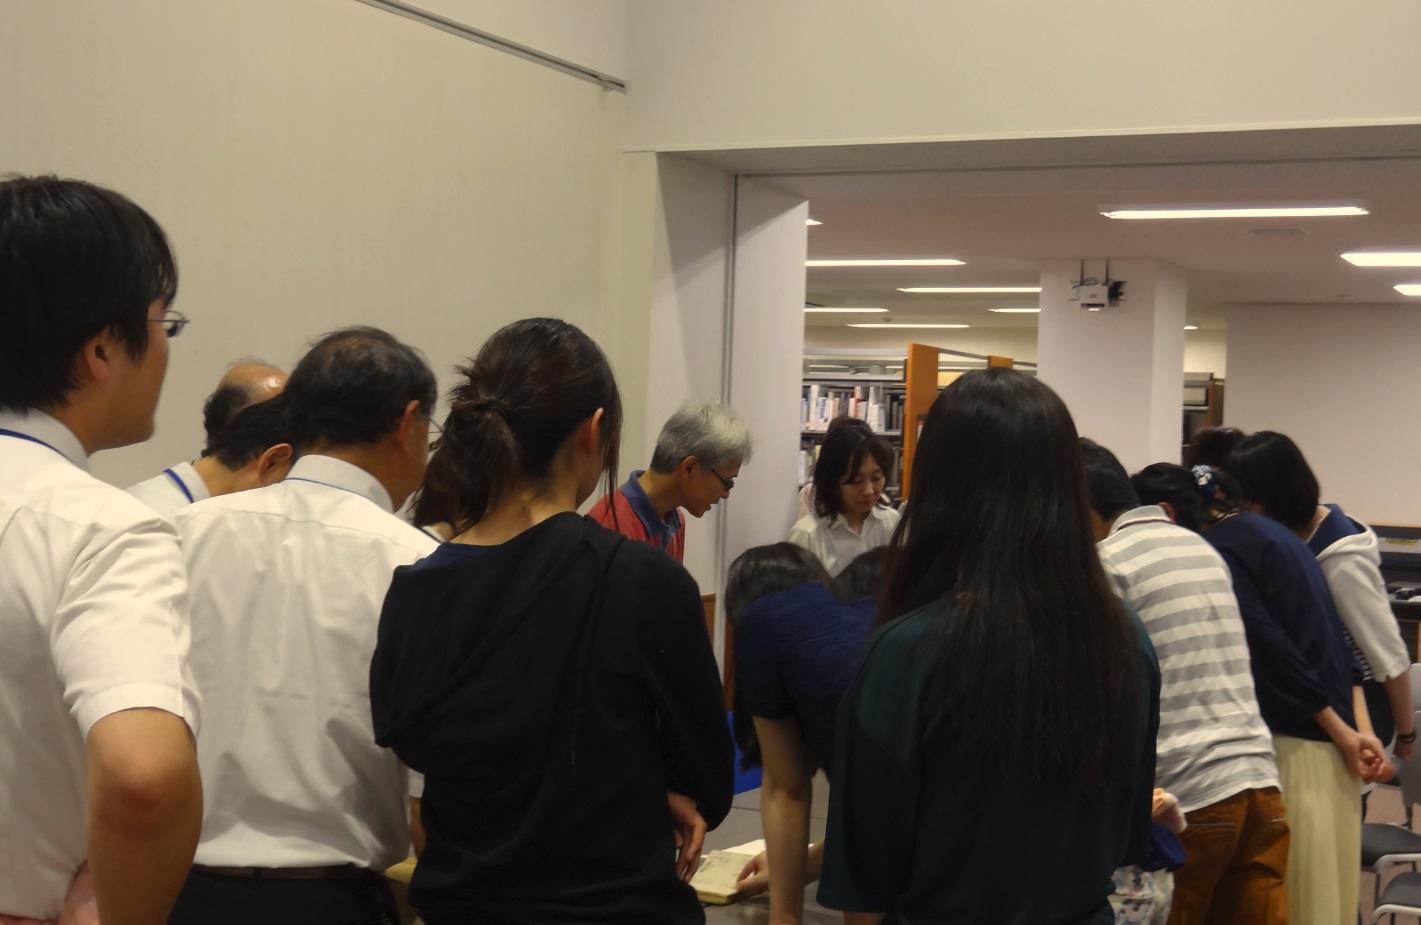 http://www.shinshu-u.ac.jp/institution/library/matsumoto/9ec411c96f40e5699a51366f5e0f10bd_1.jpg